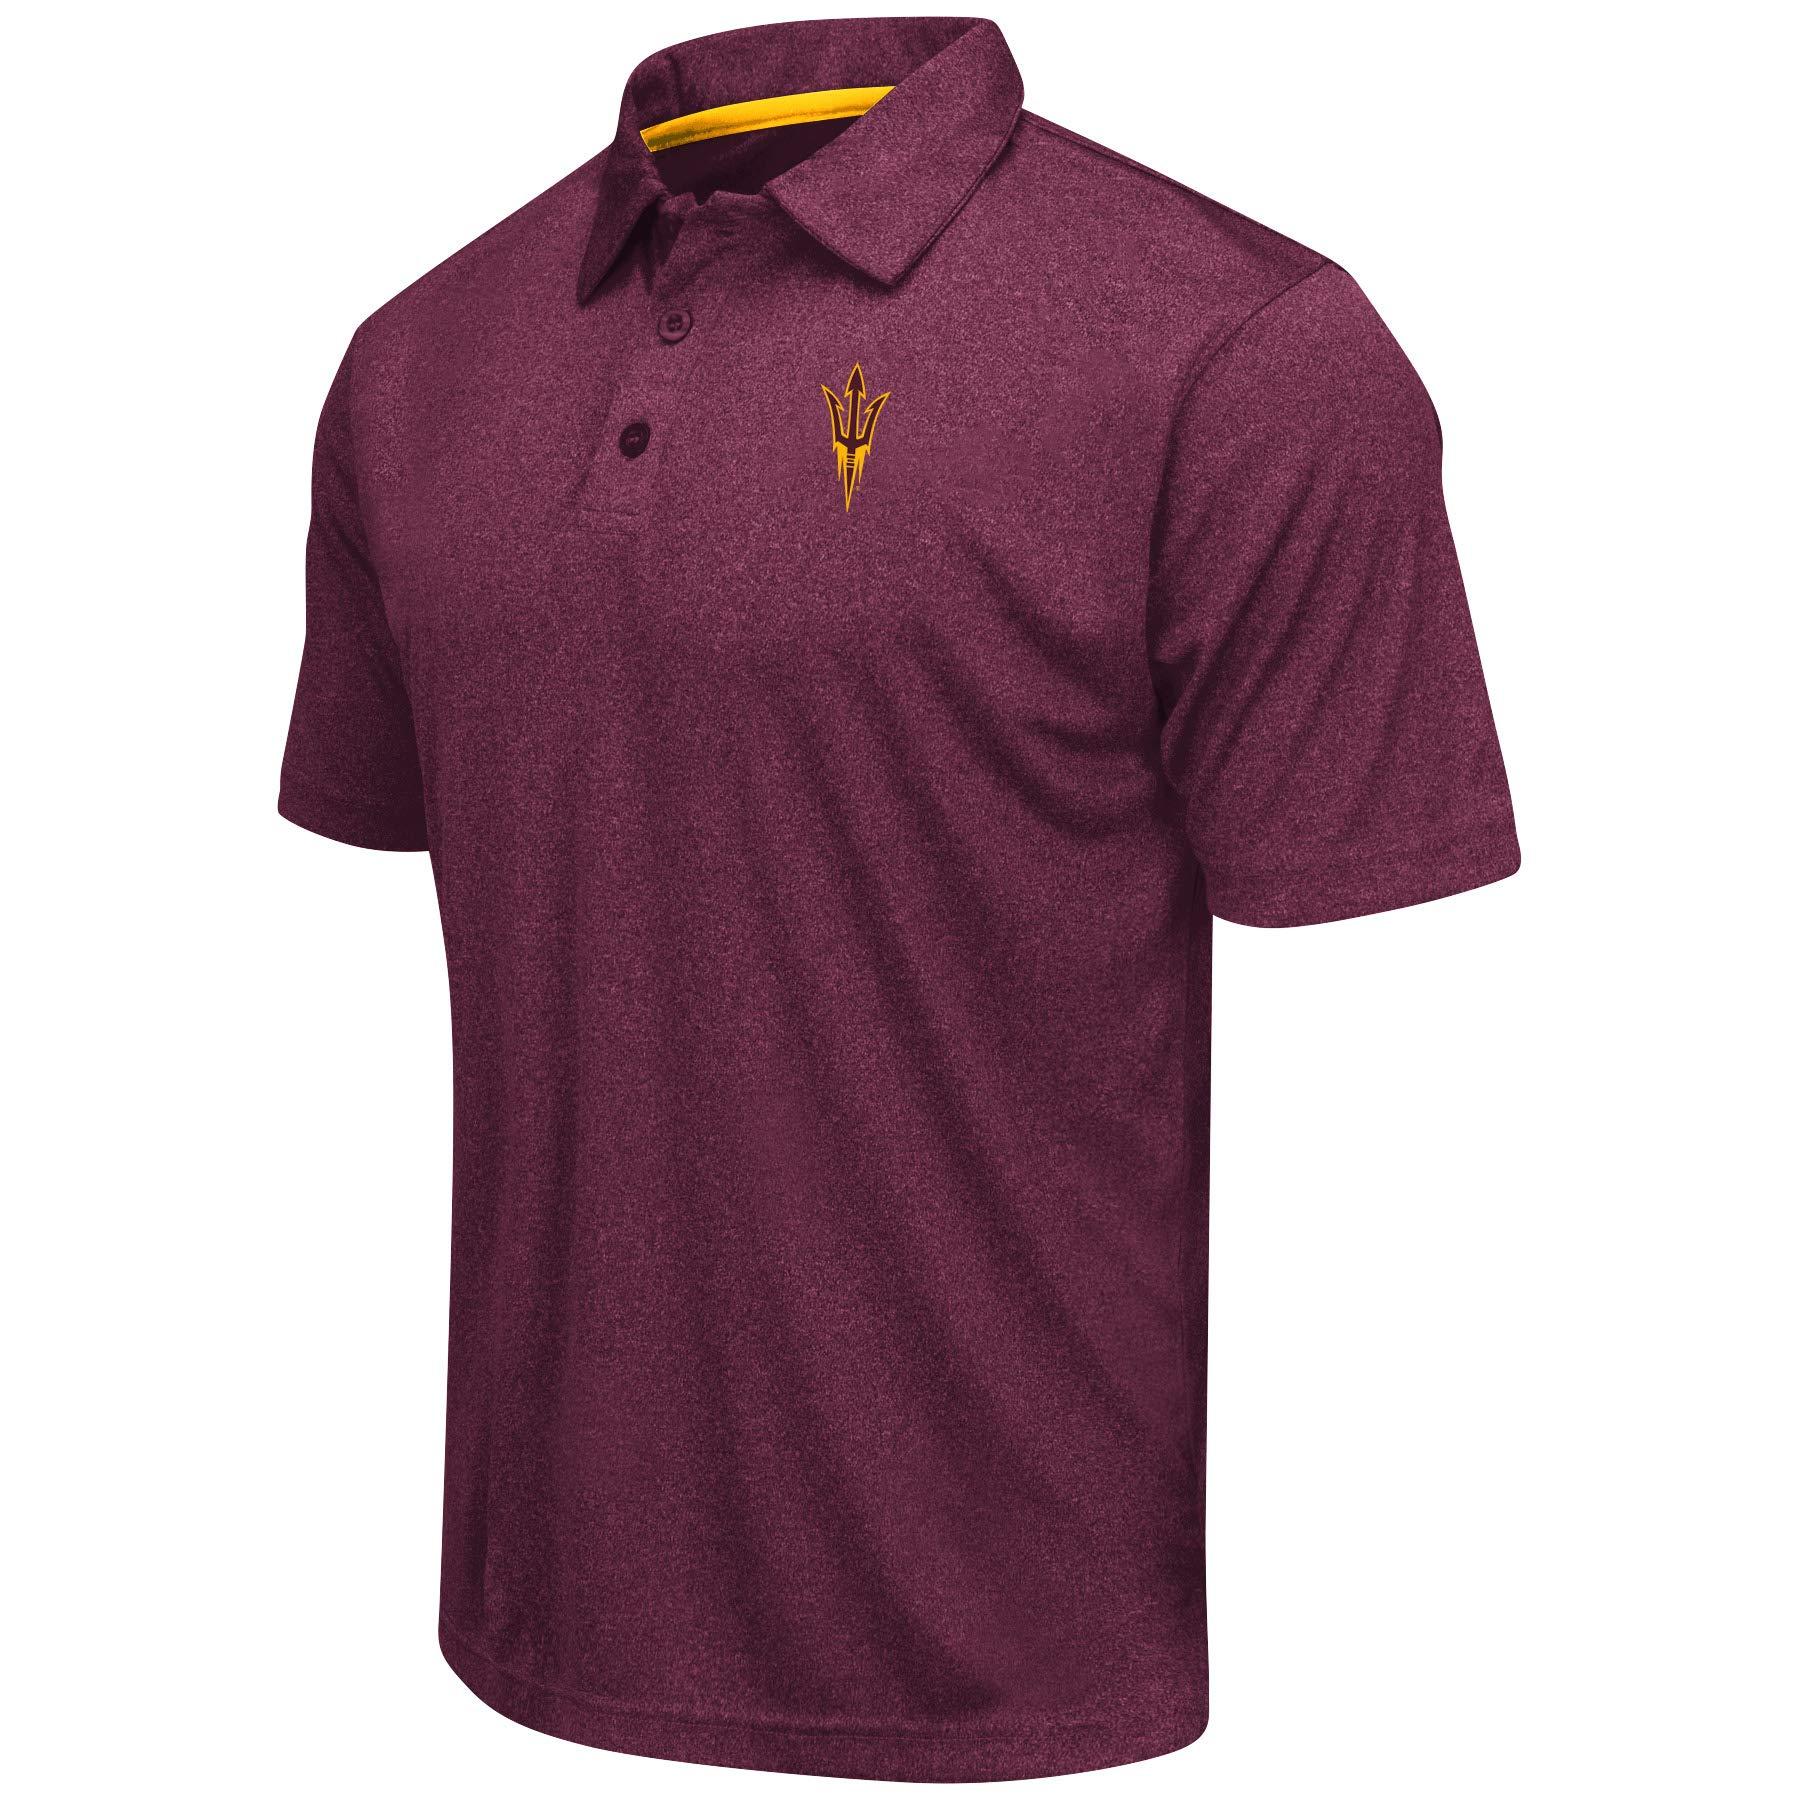 Colosseum Men's NCAA Heathered Trend-Setter Golf/Polo Shirt-Arizona State Sun Devils-Heathered Maroon-XXL